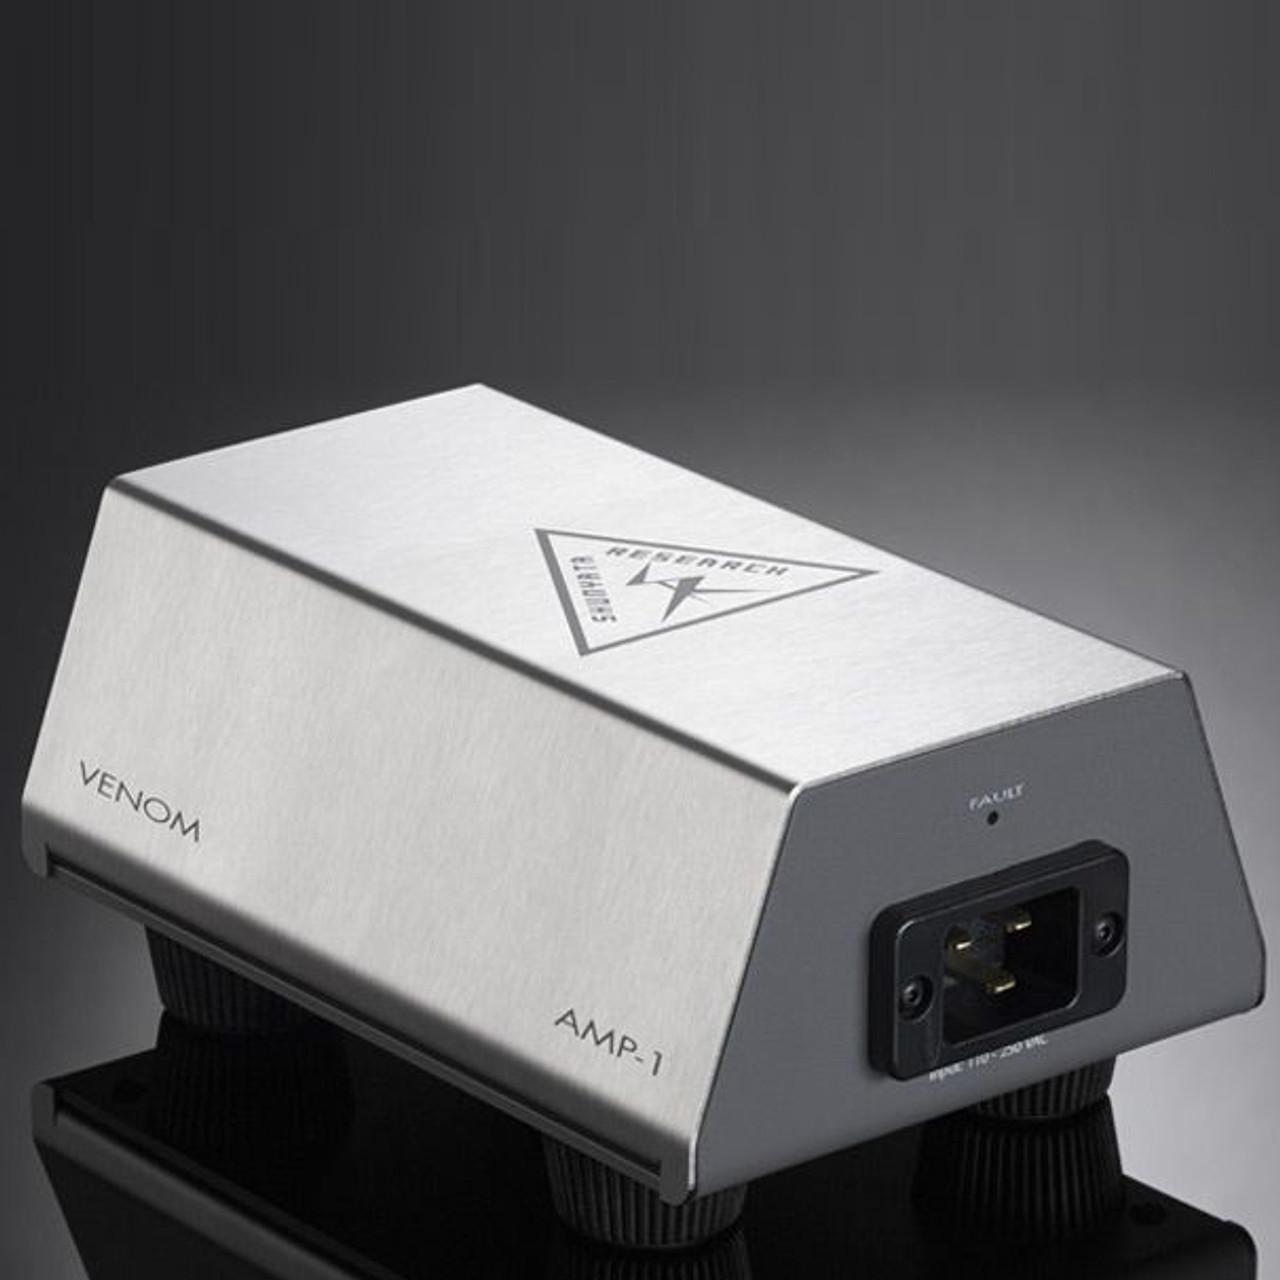 Shunyata Research Venom AMP-1 single outlet distributor